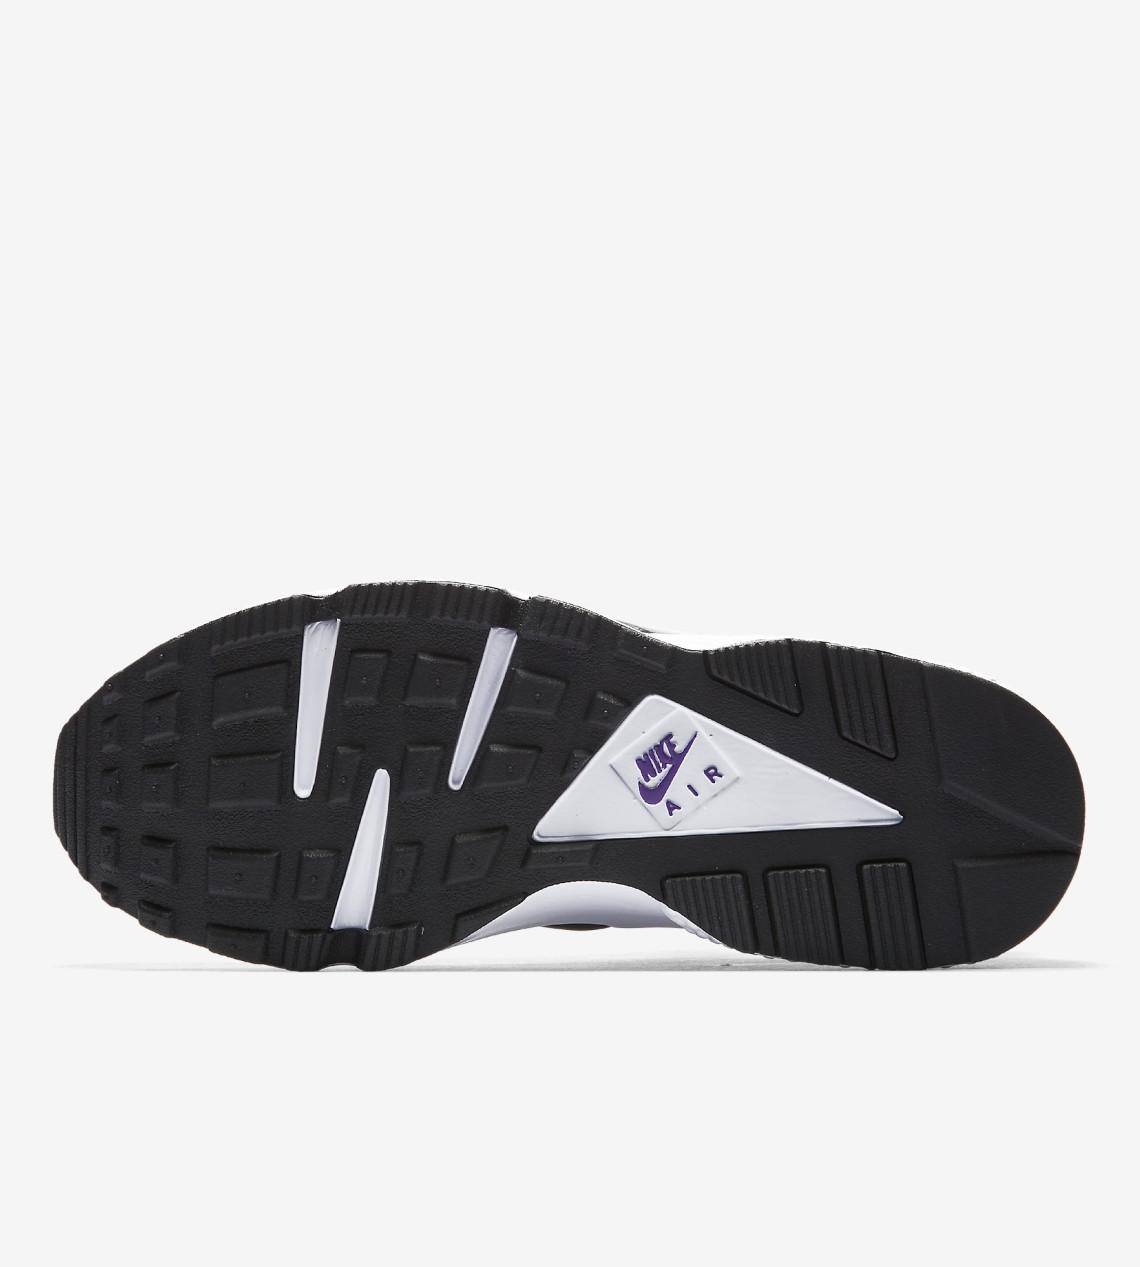 ce73294ceeba7 The Nike Air Huarache Purple Punch OG 2018 Makes A Quiet Return ...